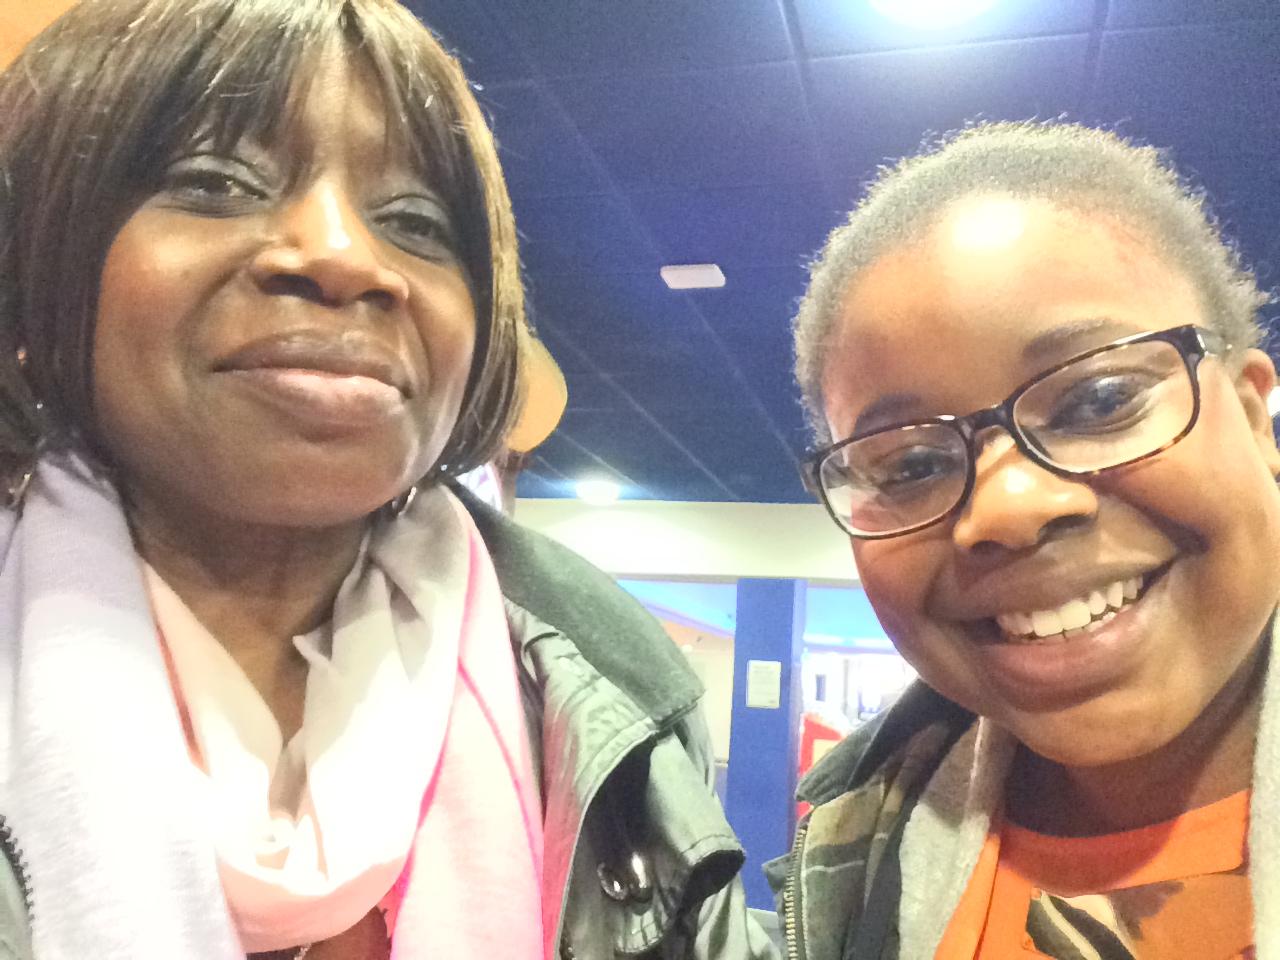 Me and mum at the cinema